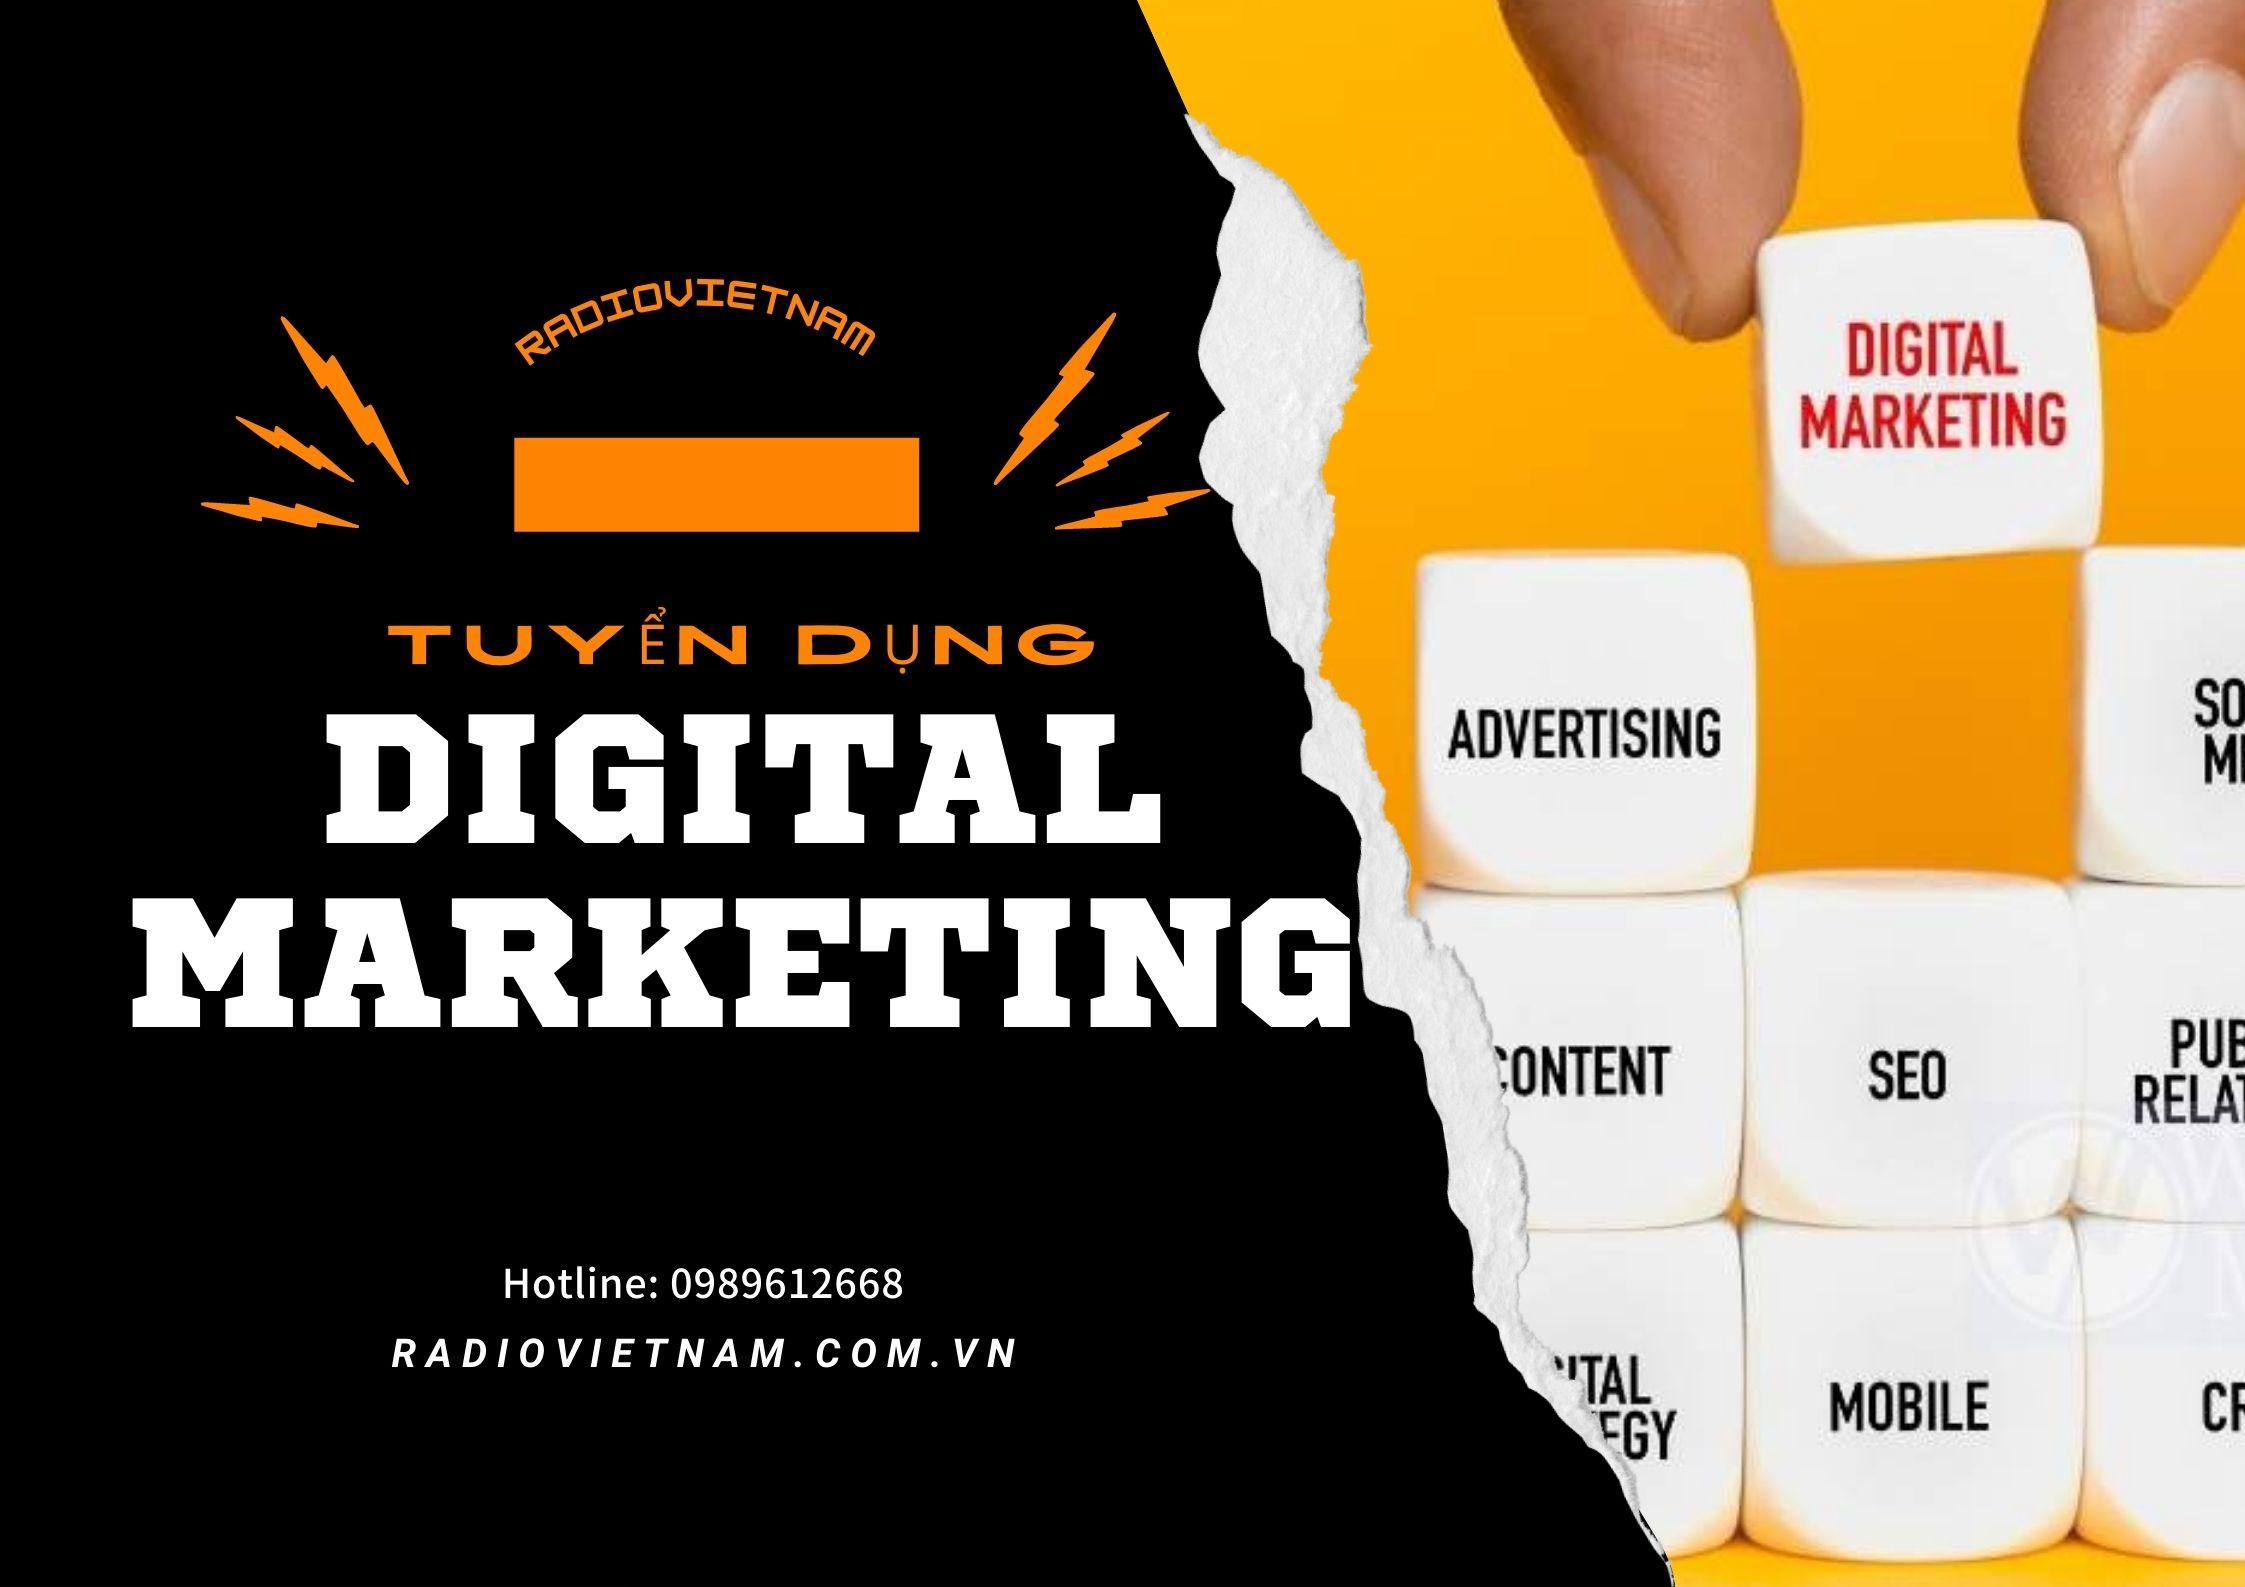 tuyển dụng digtal marketing